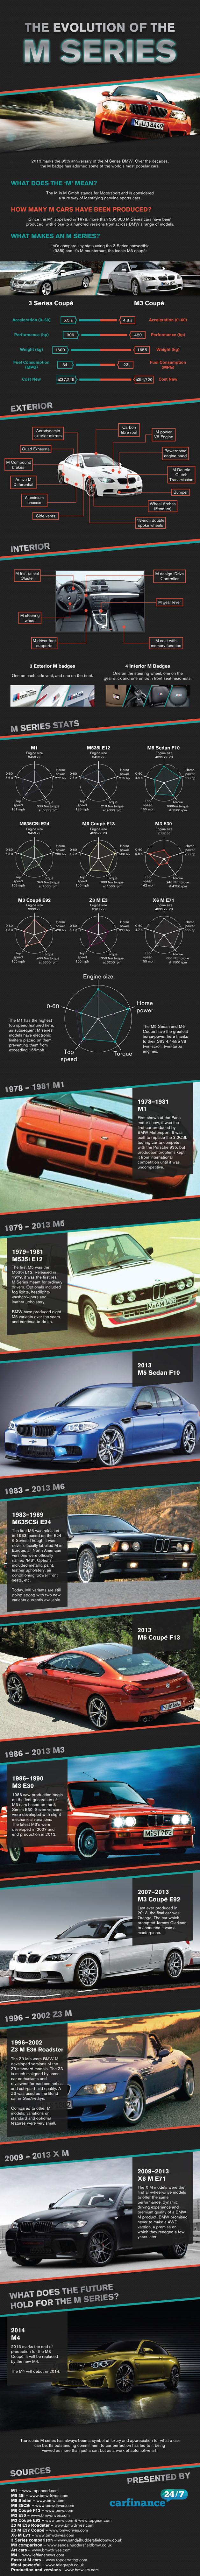 BMW M infographic